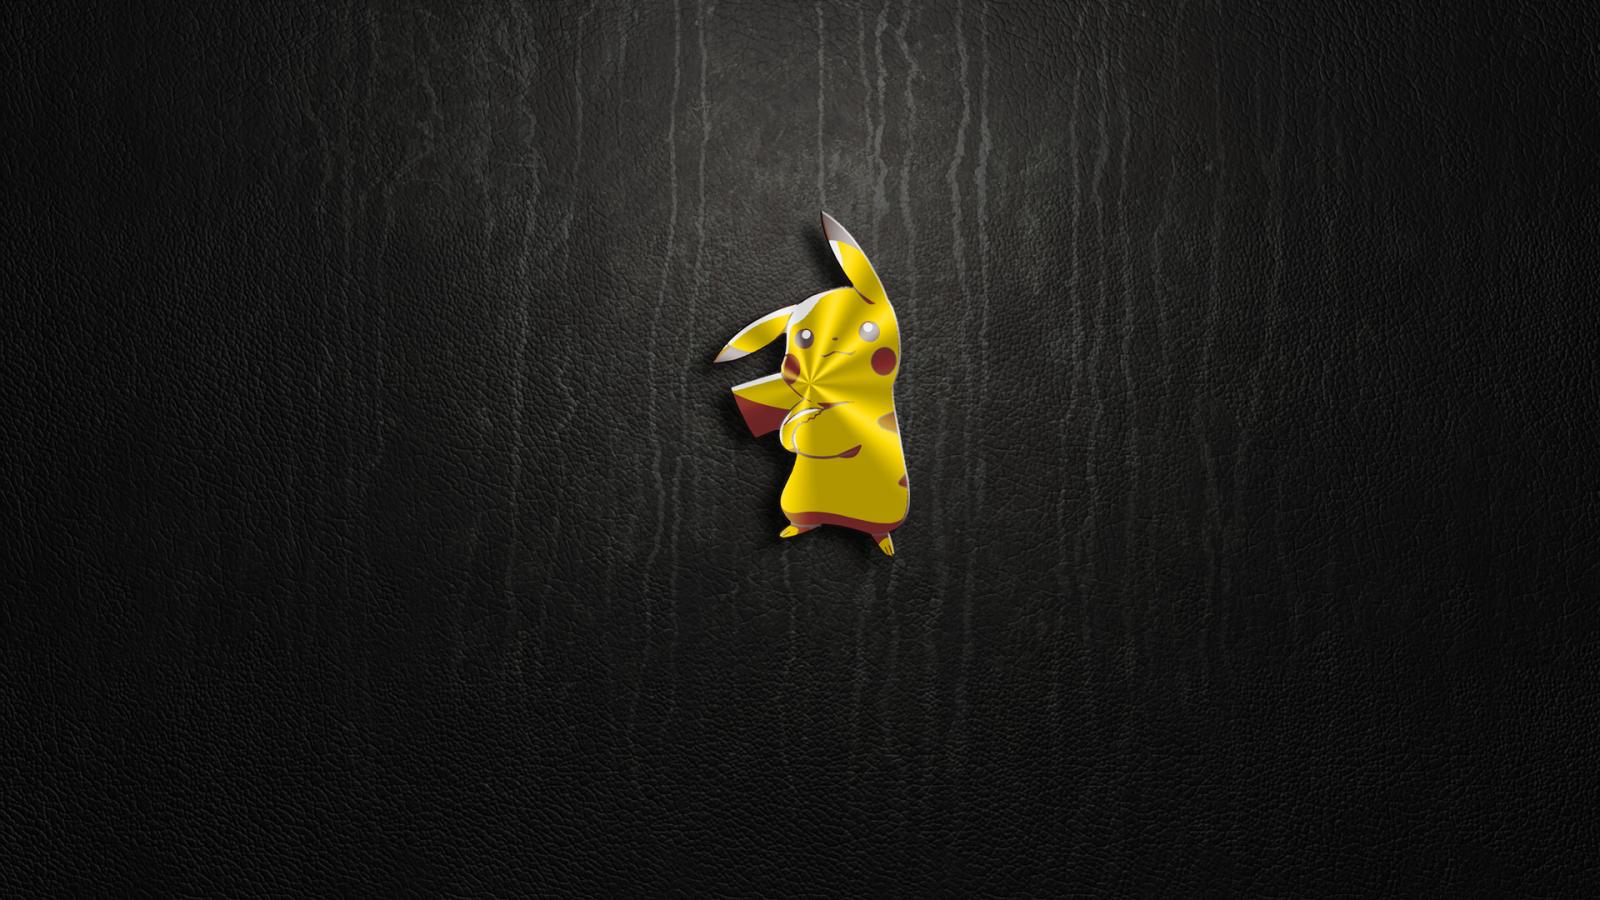 Fond d'écran : blanc, noir, logo, jaune, Pok mon, Pikachu ...